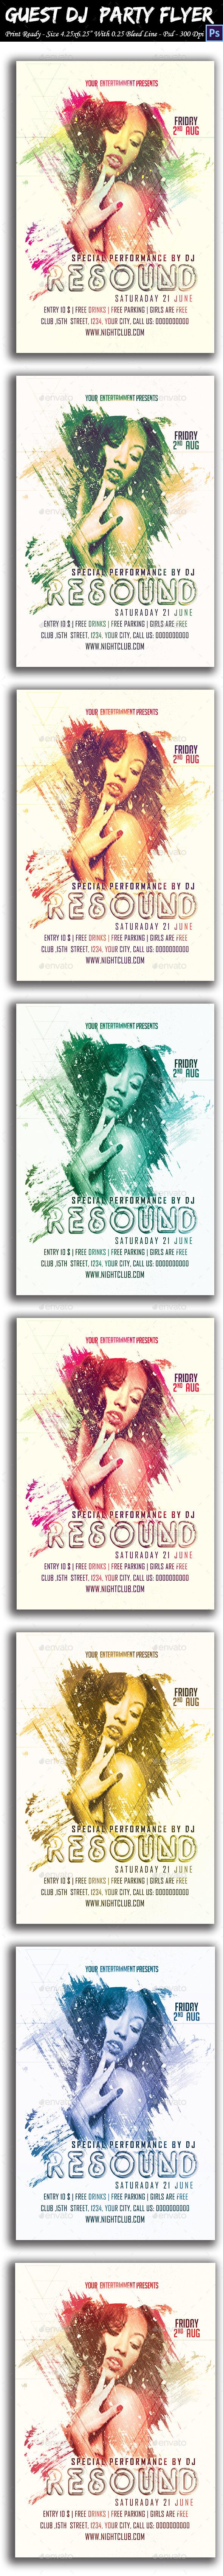 GraphicRiver Guest DJ Party Flyer 8789911